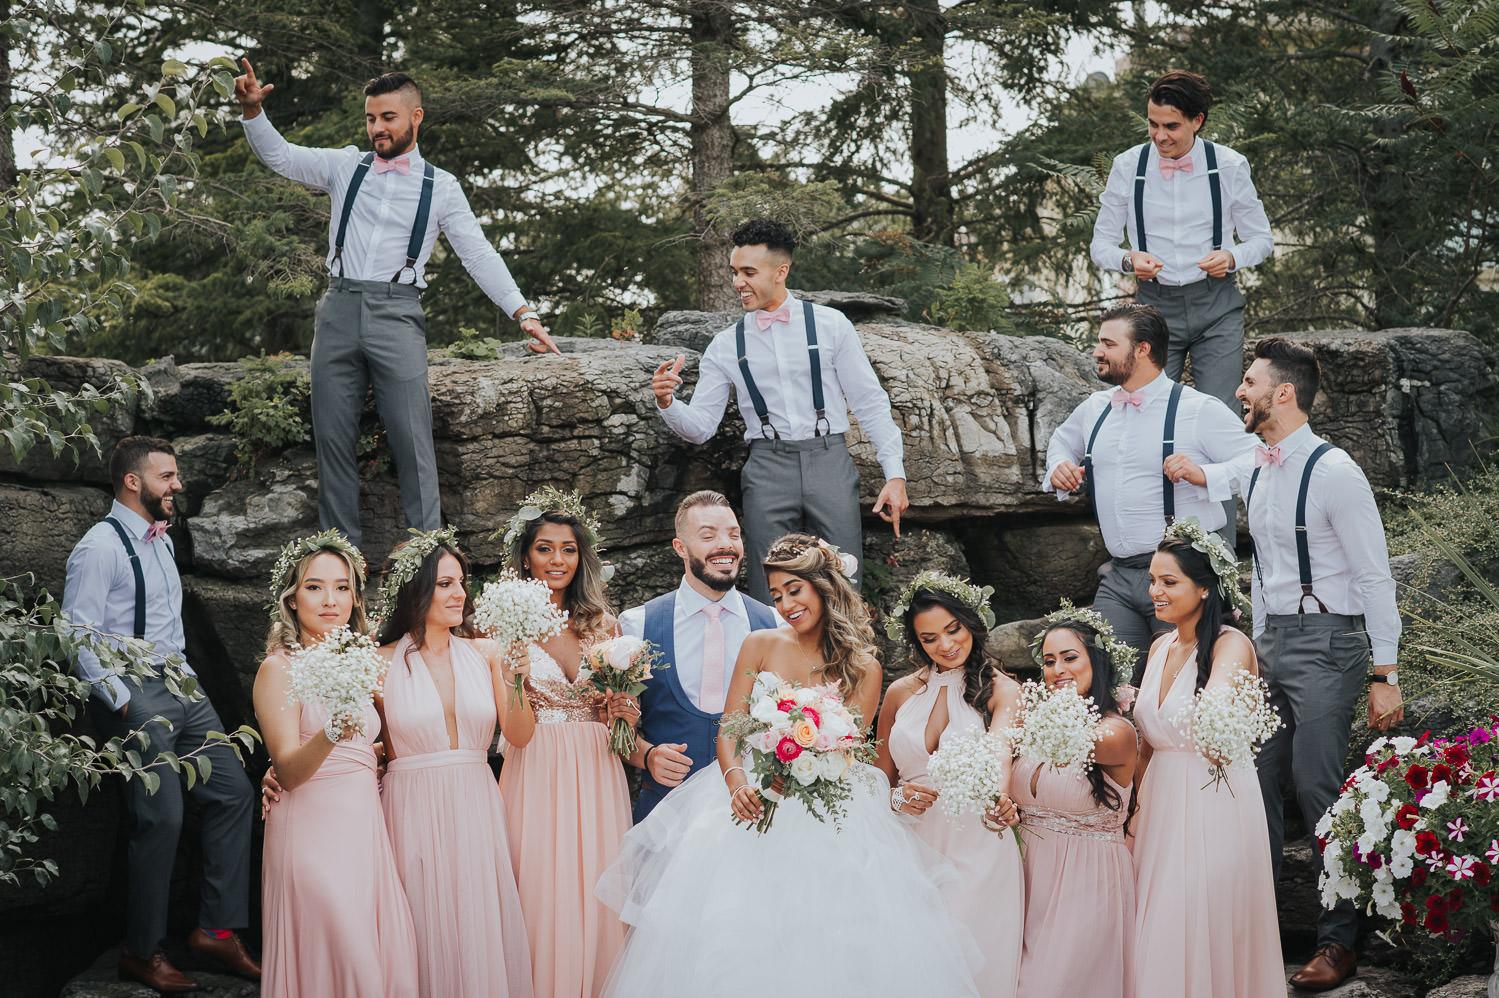 Bridal Party dancing at a Toronto Outdoor Wedding